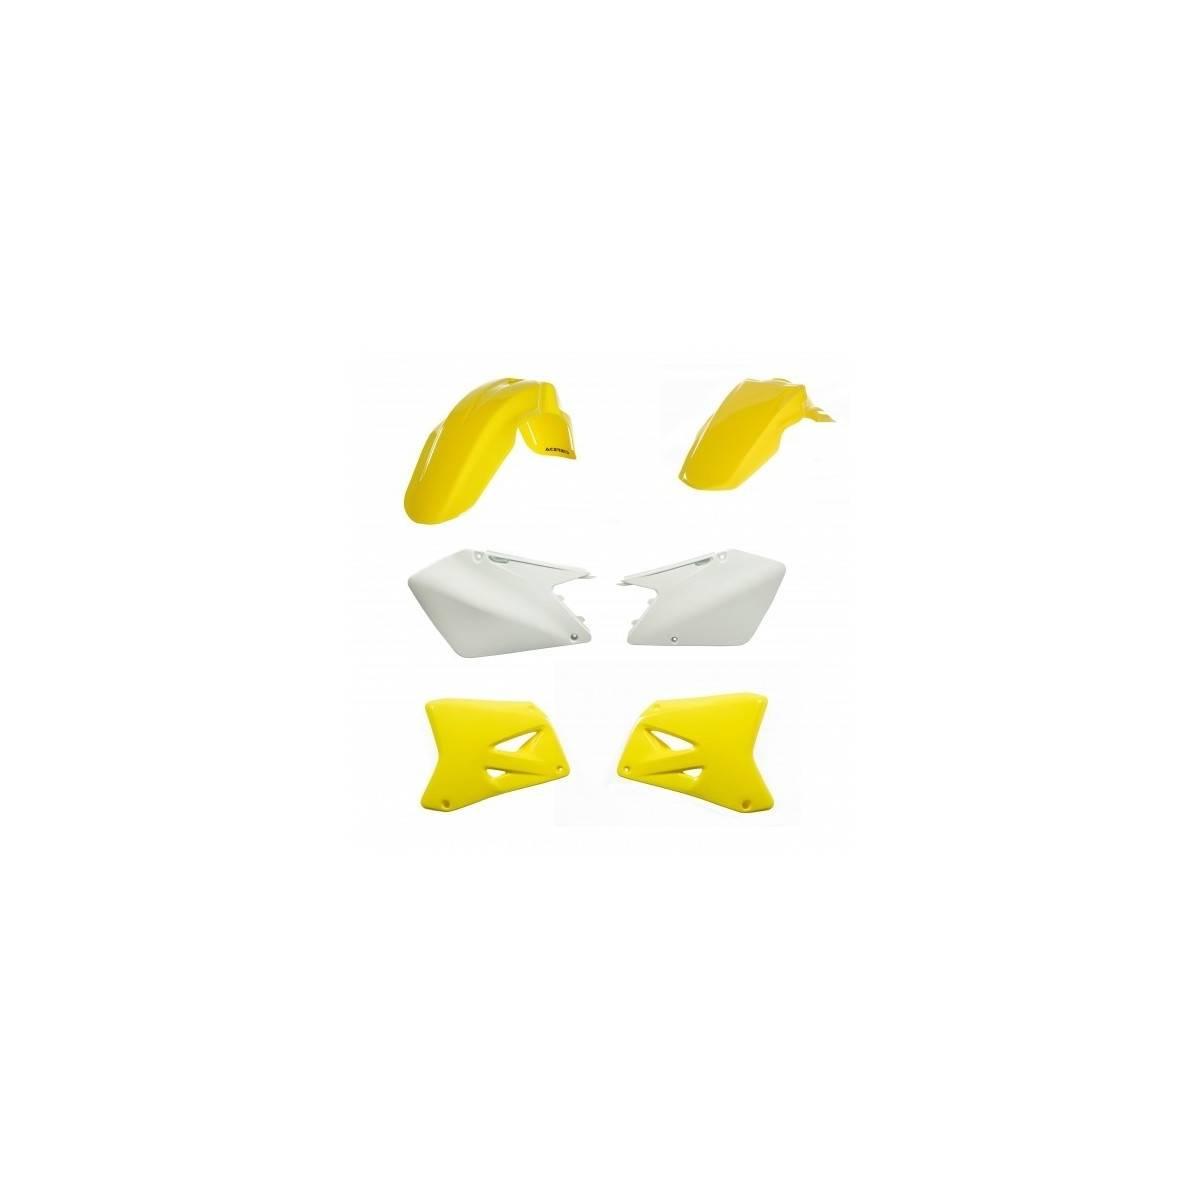 0023066-061 - Kit Plasticos Rmz 450 18 Amarillo Fluor